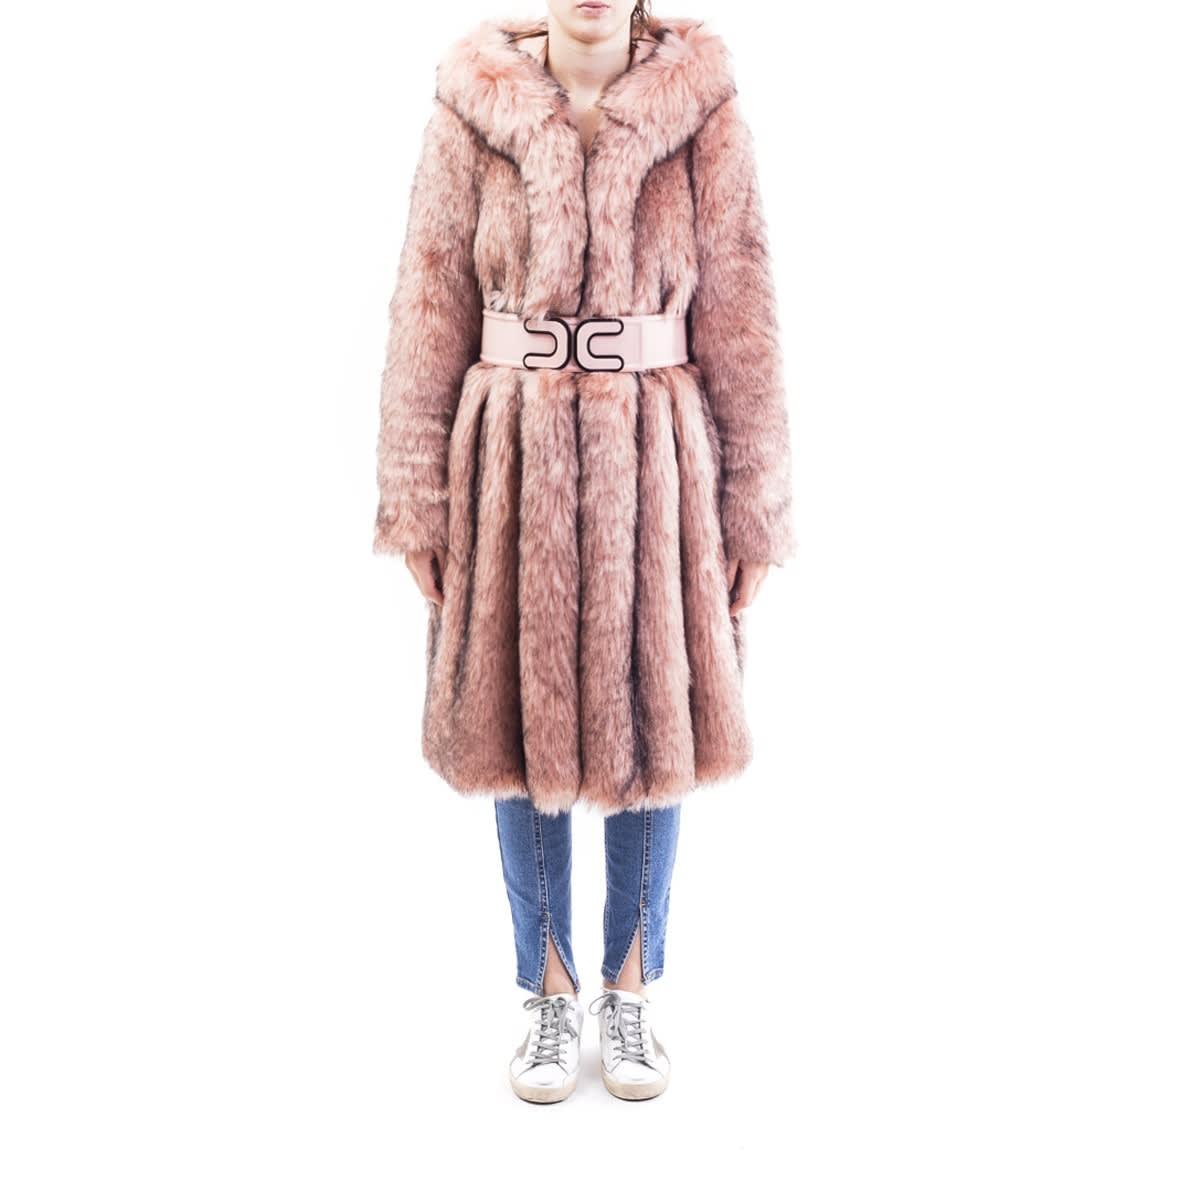 Photo of  Elisabetta Franchi Coat- shop Elisabetta Franchi Celyn B. jackets online sales